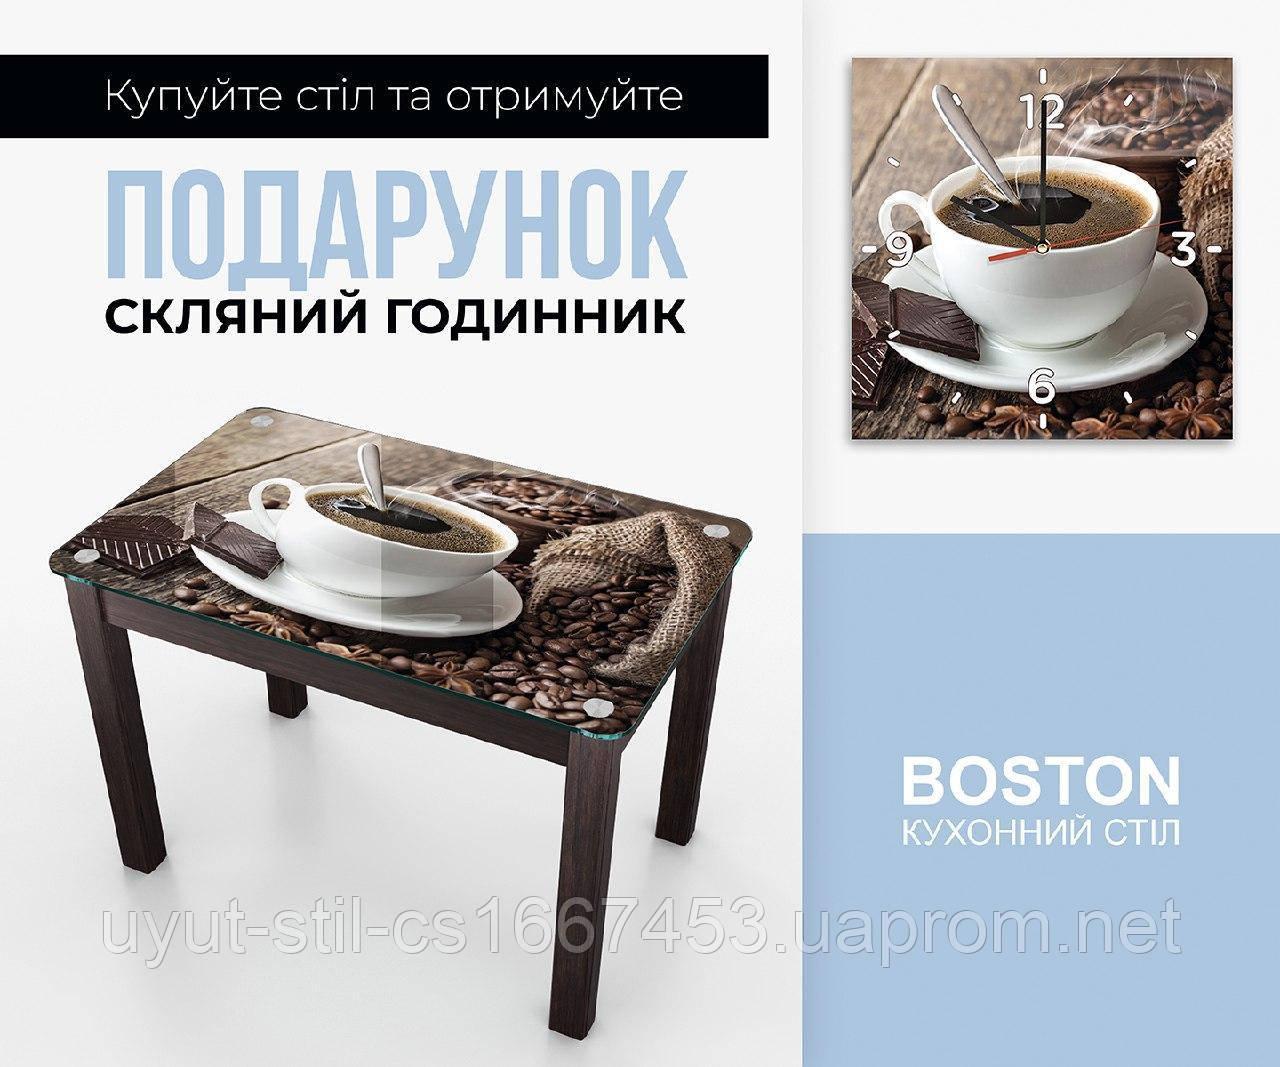 Обеденный стол Boston